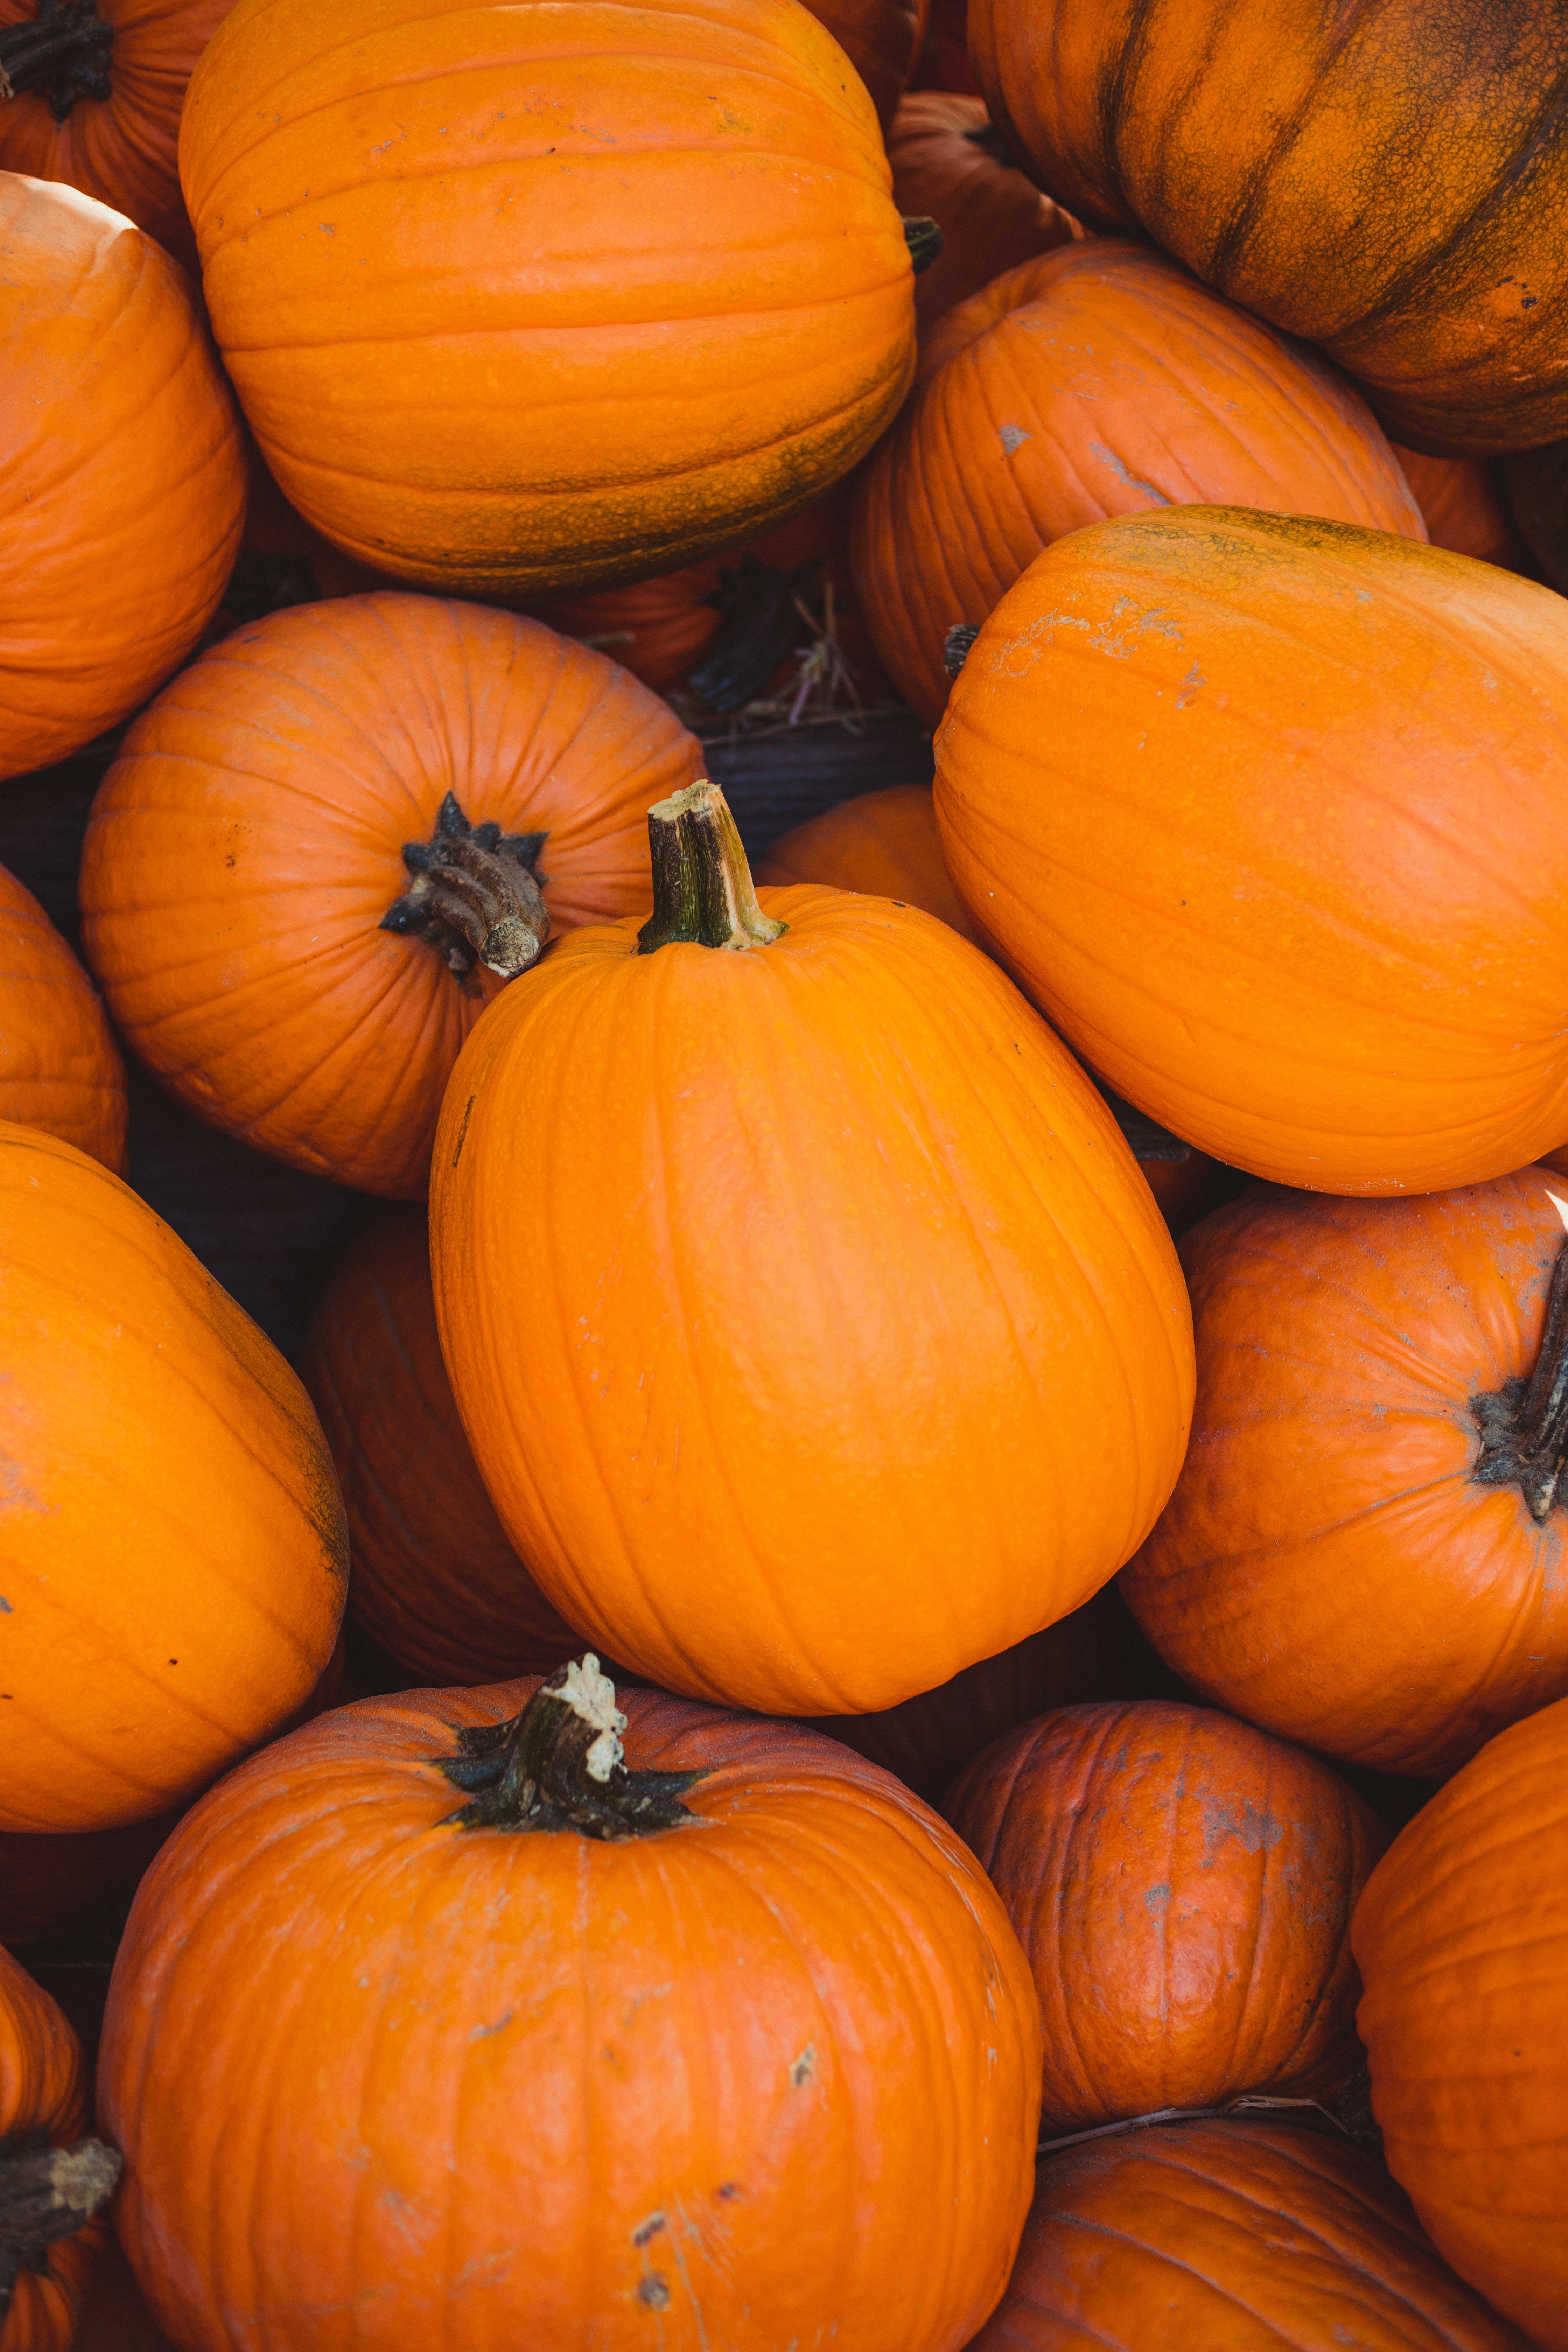 900  Pumpkin Images  Download Hd Pictures  U0026 Photos On Unsplash